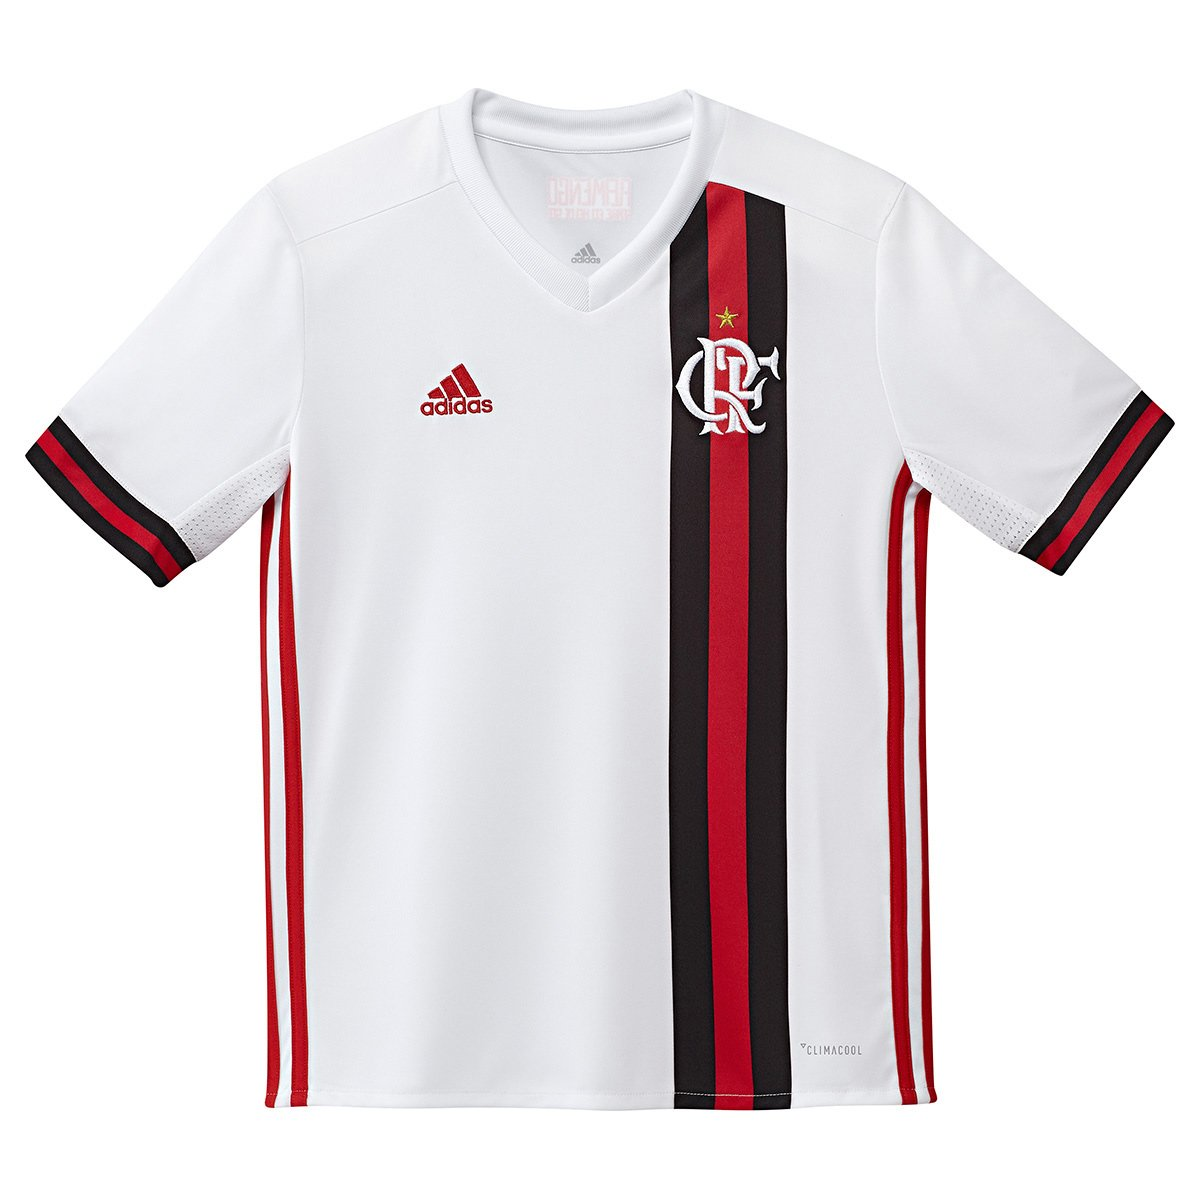 3f3e6fce24faa Camisa Flamengo Infantil II 17 18 s nº Torcedor Adidas - Compre Agora